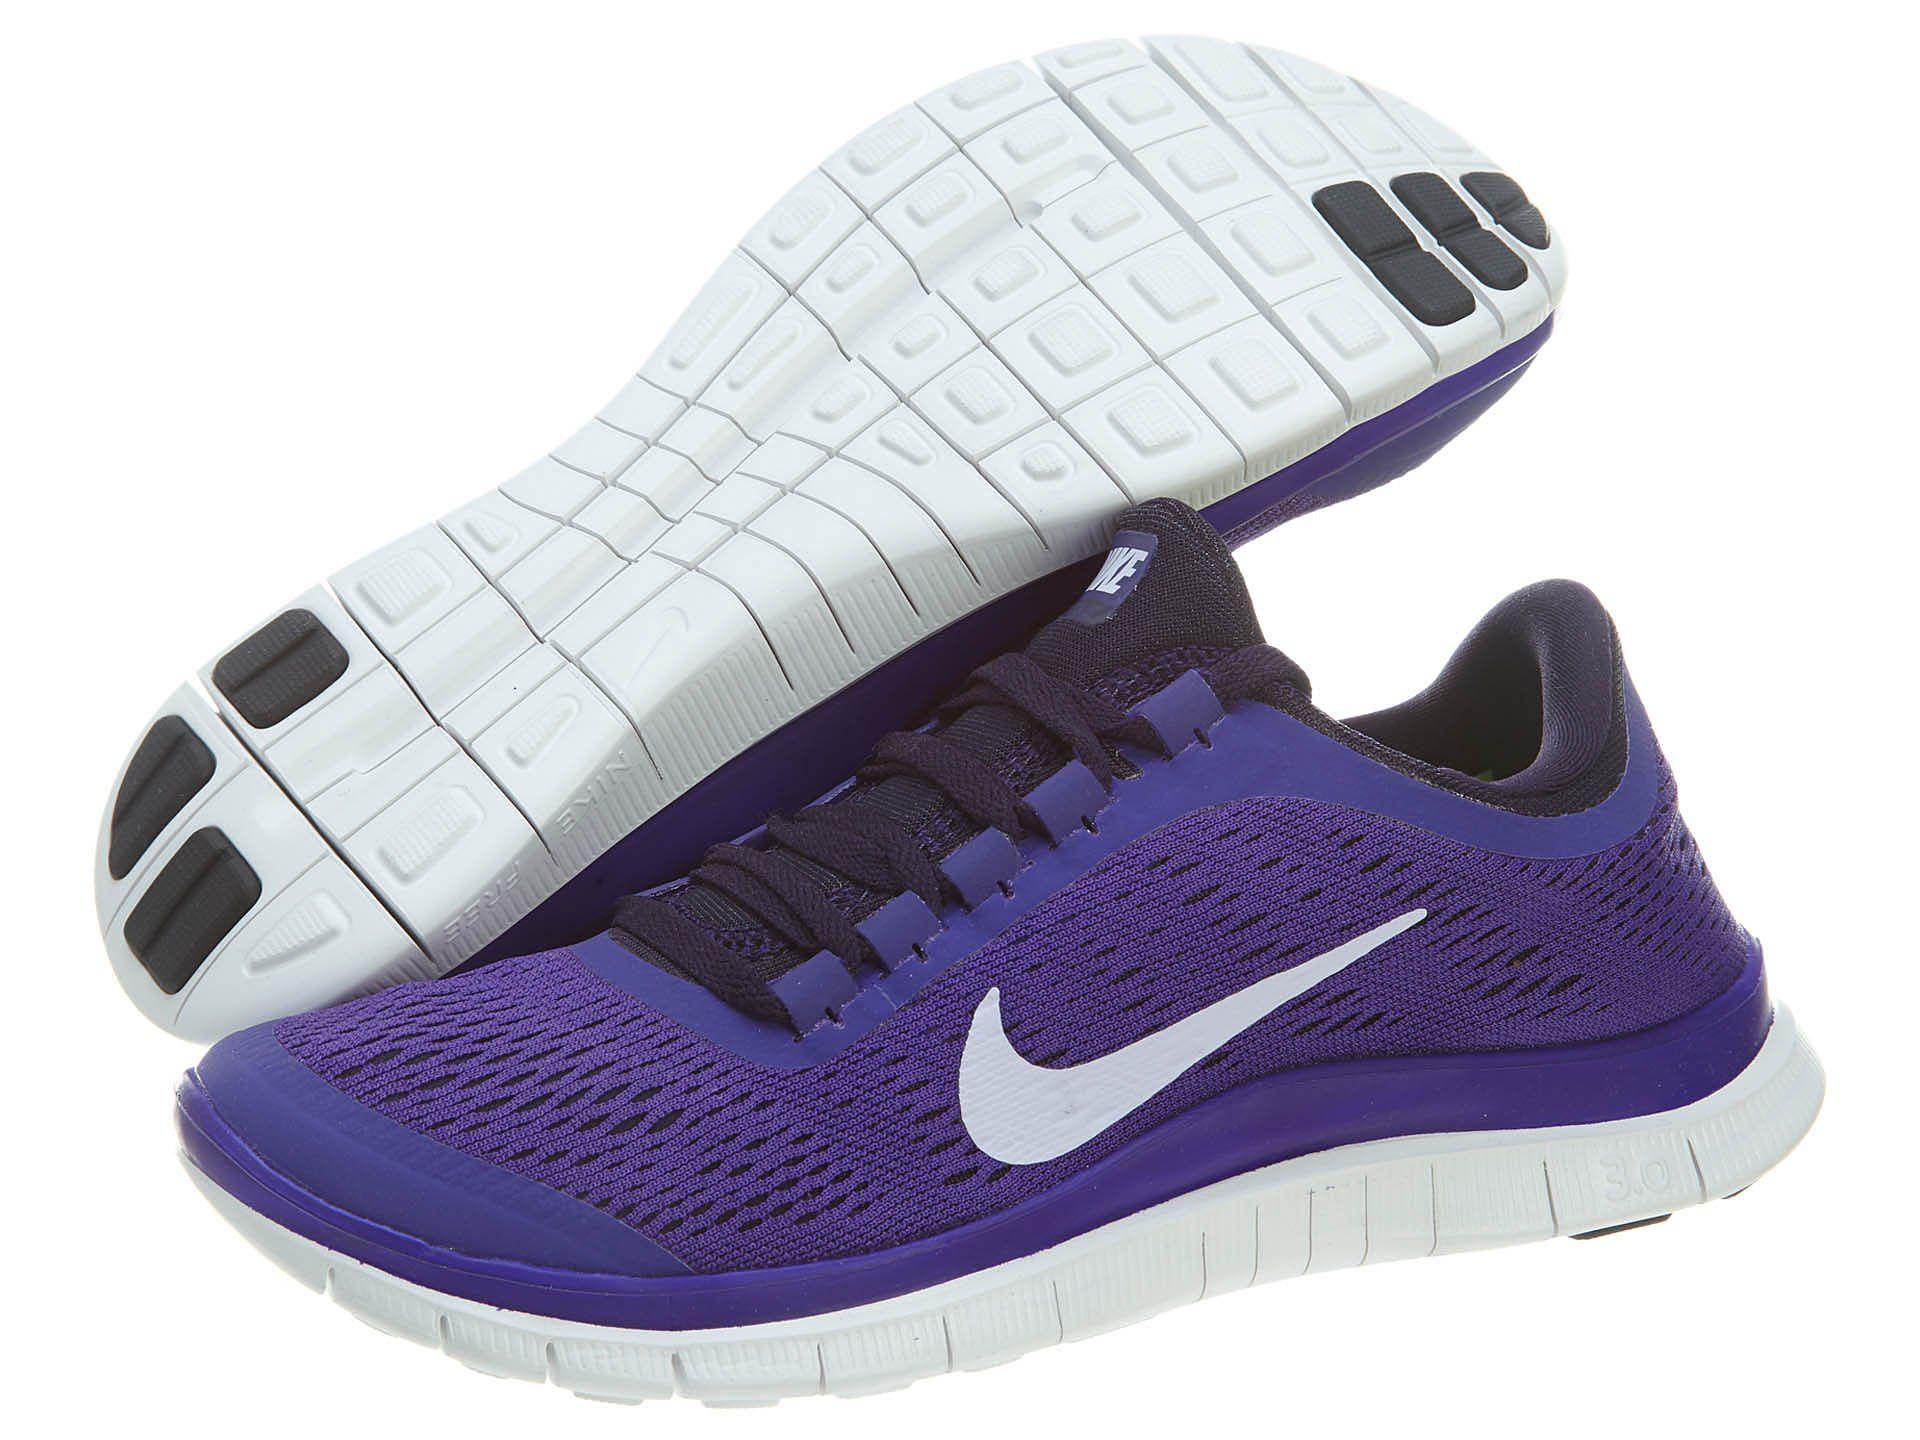 625cf8463bdeb4 ... new style amazon nike free 3.0 ladies running shoes sports outdoors  adb59 569f0